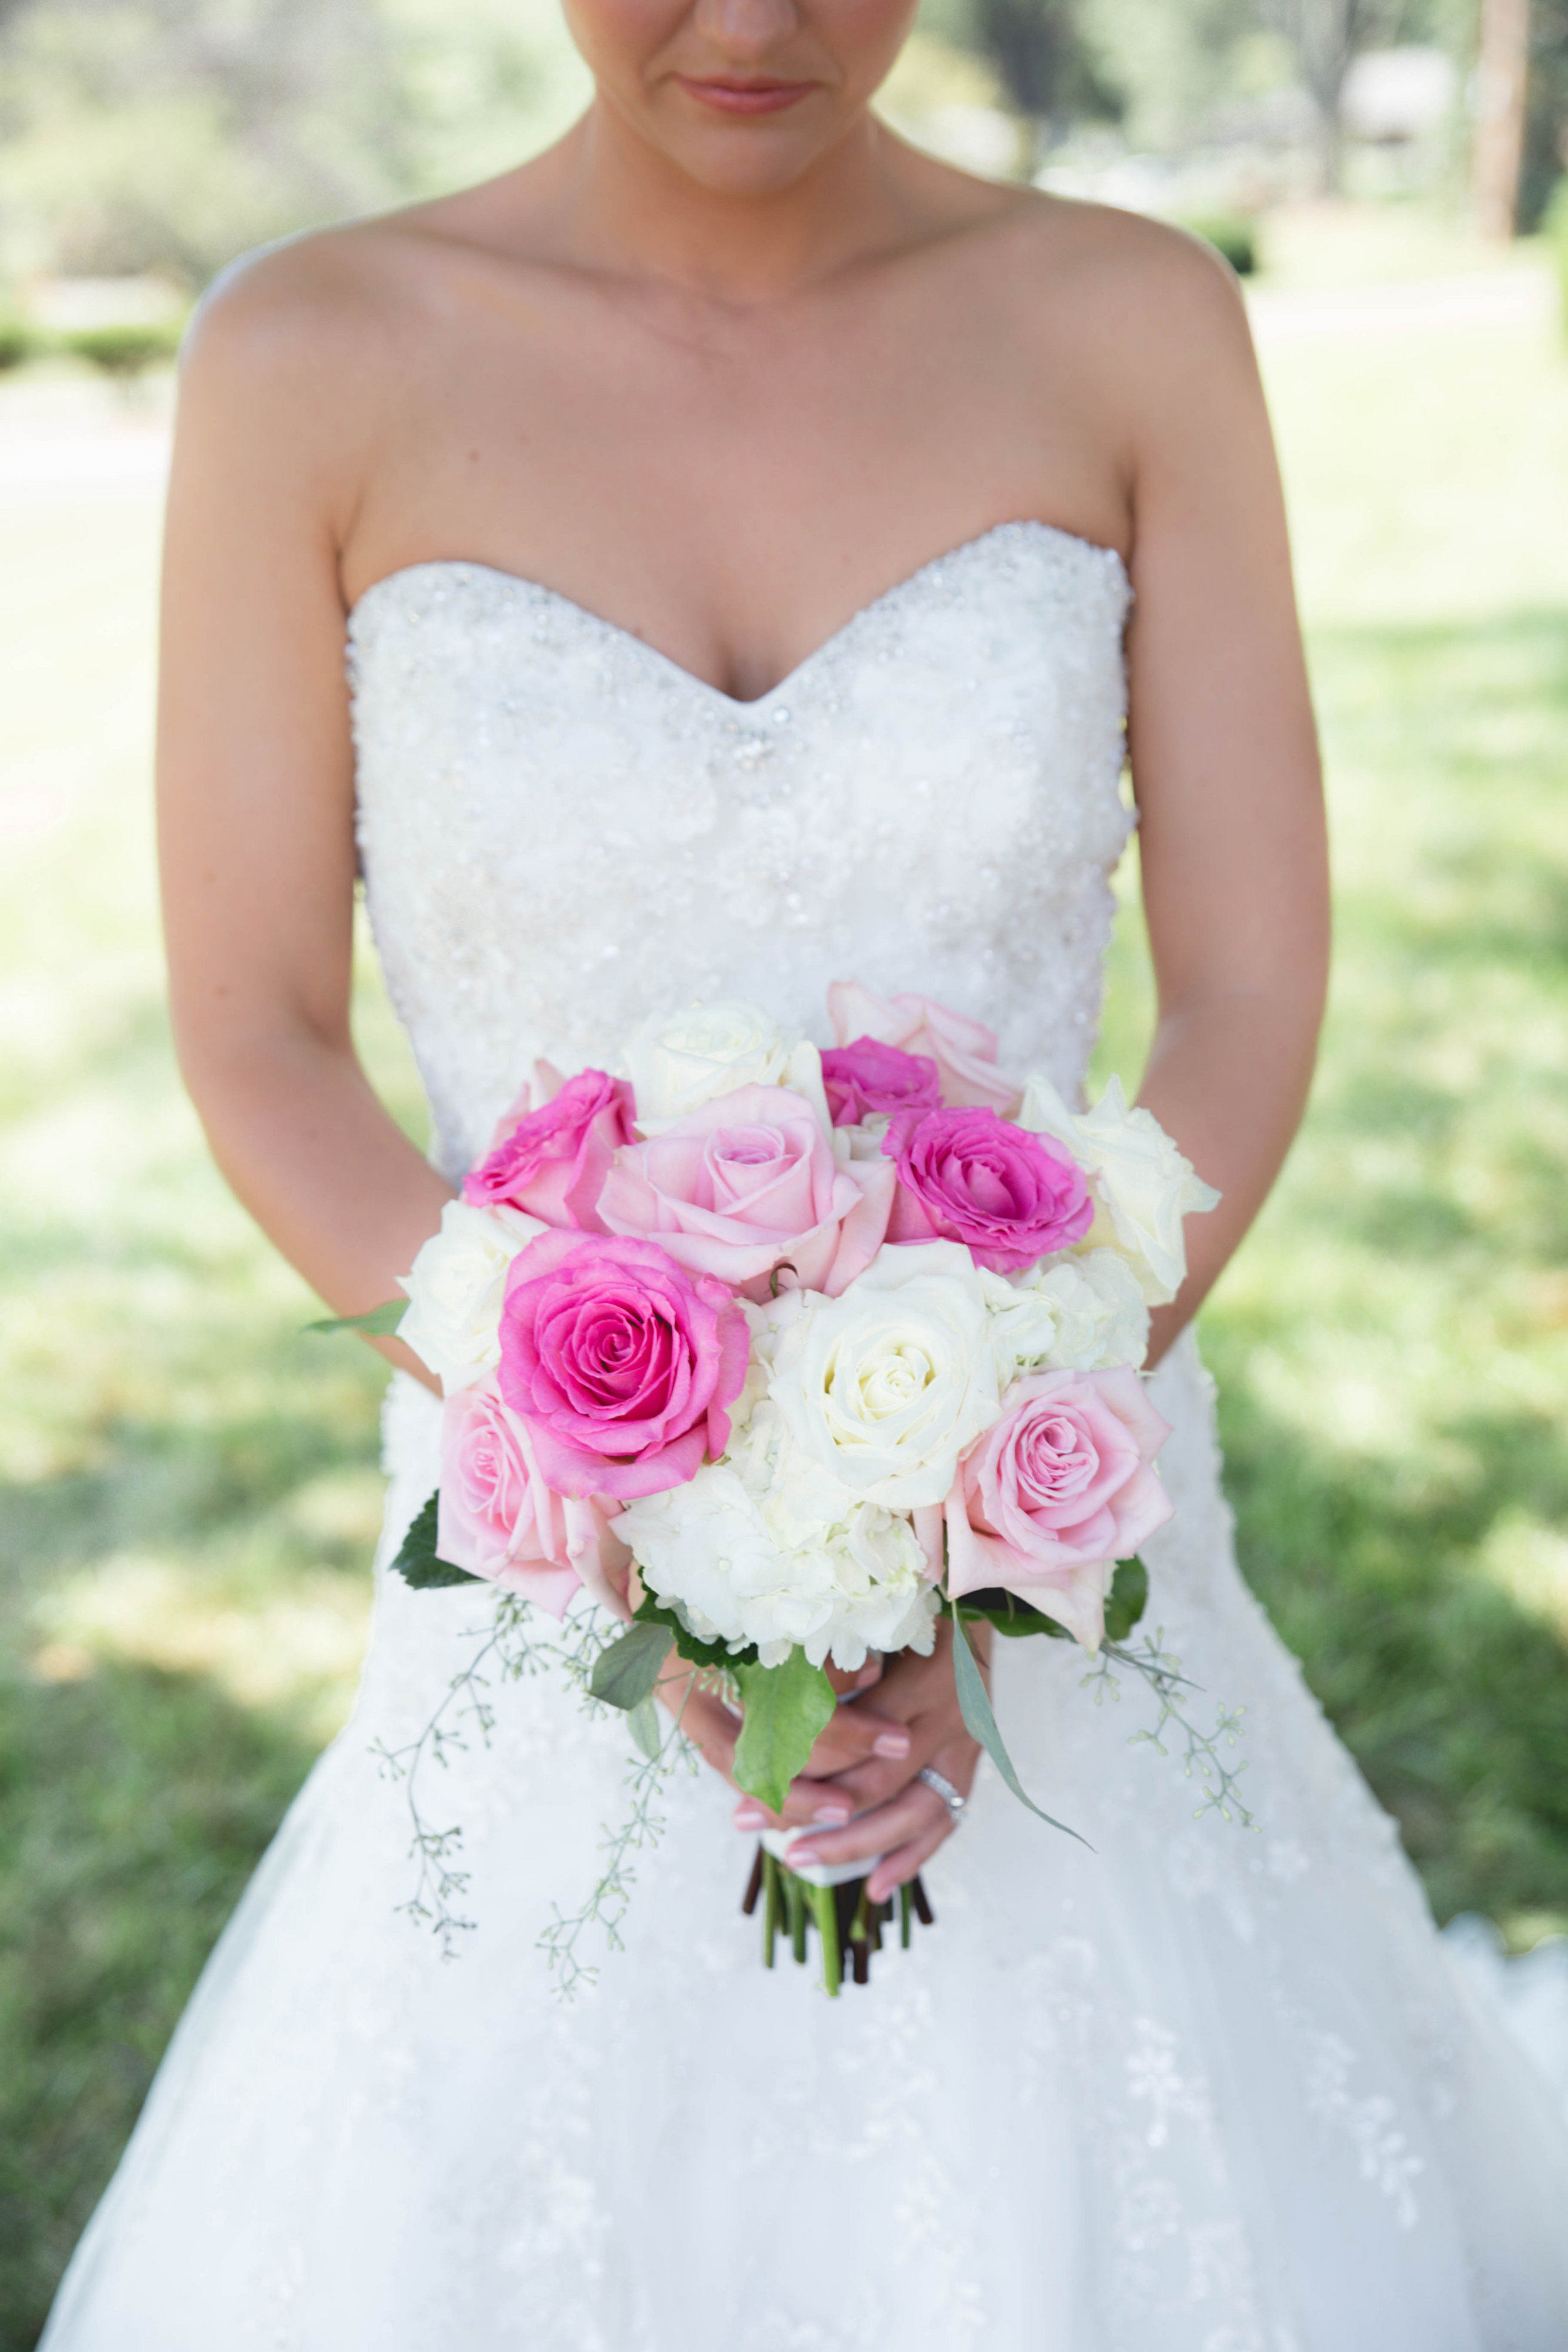 Donelson Wedding-Donelson-0072.jpg